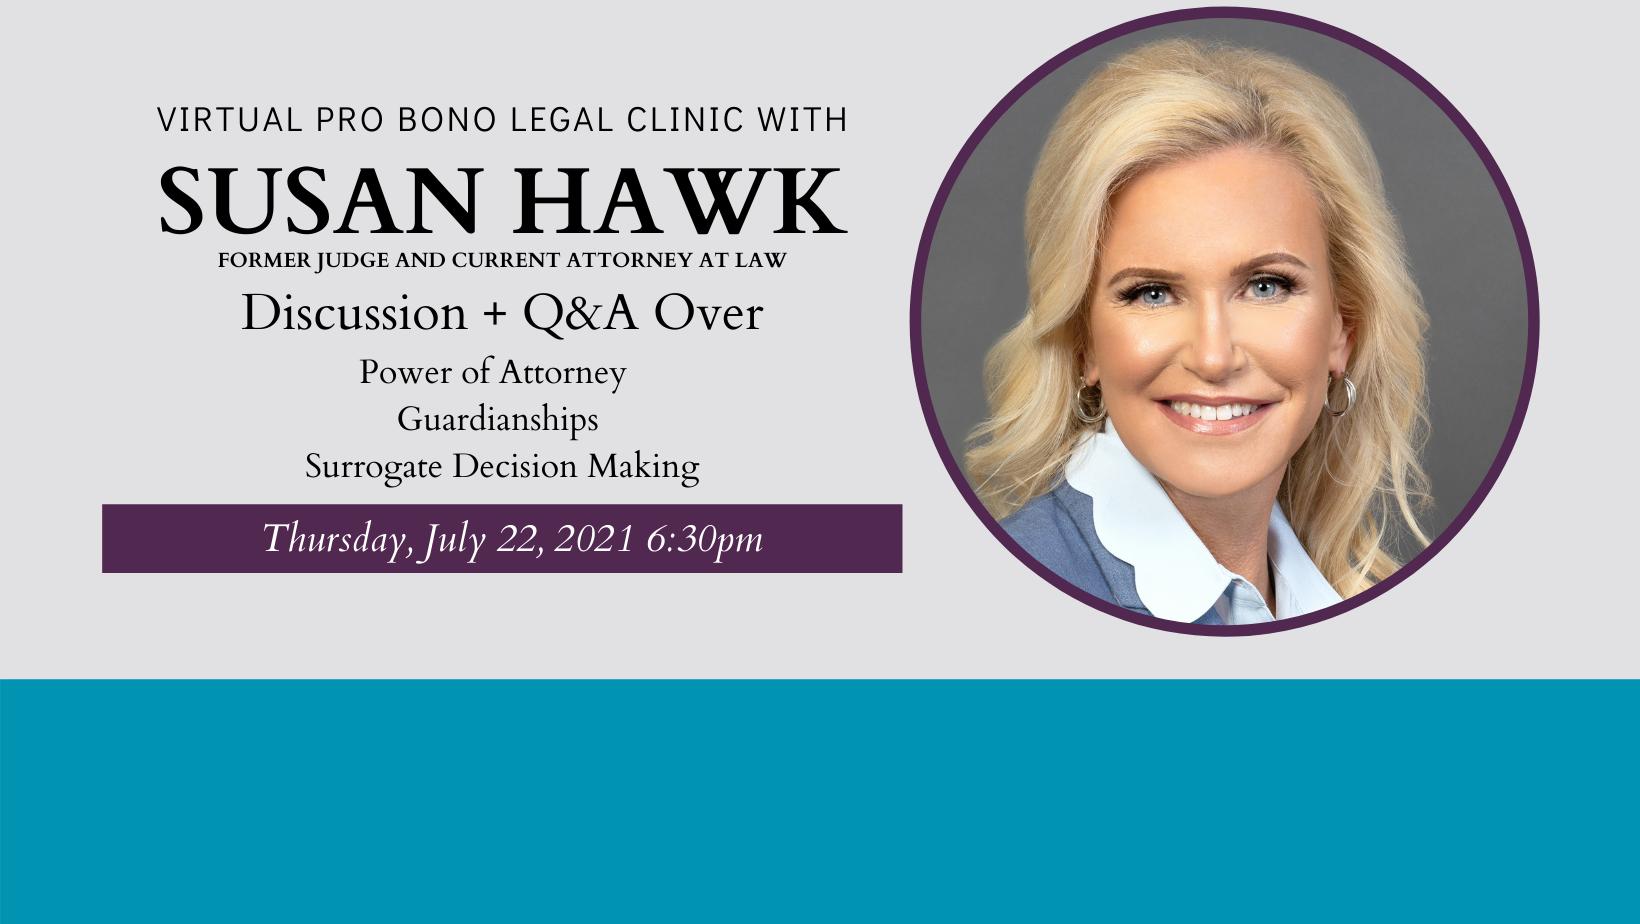 Virtual Pro Bono Legal Clinic with Susan Hawk